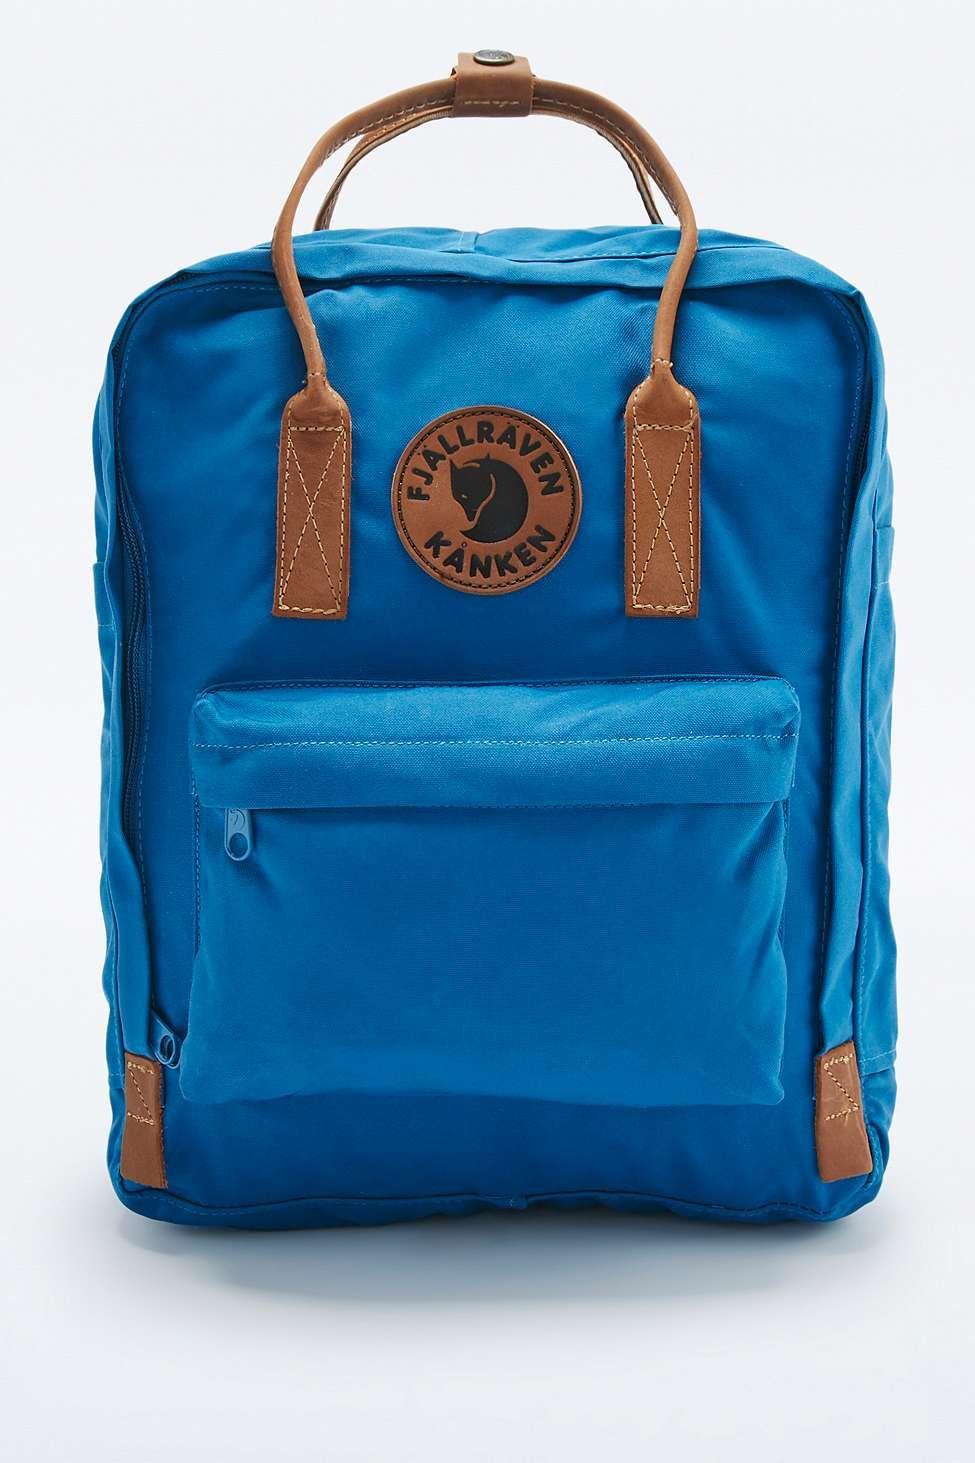 f11474b11a16 Fjallraven Kanken No. 2 Lake Blue and Leather Backpack